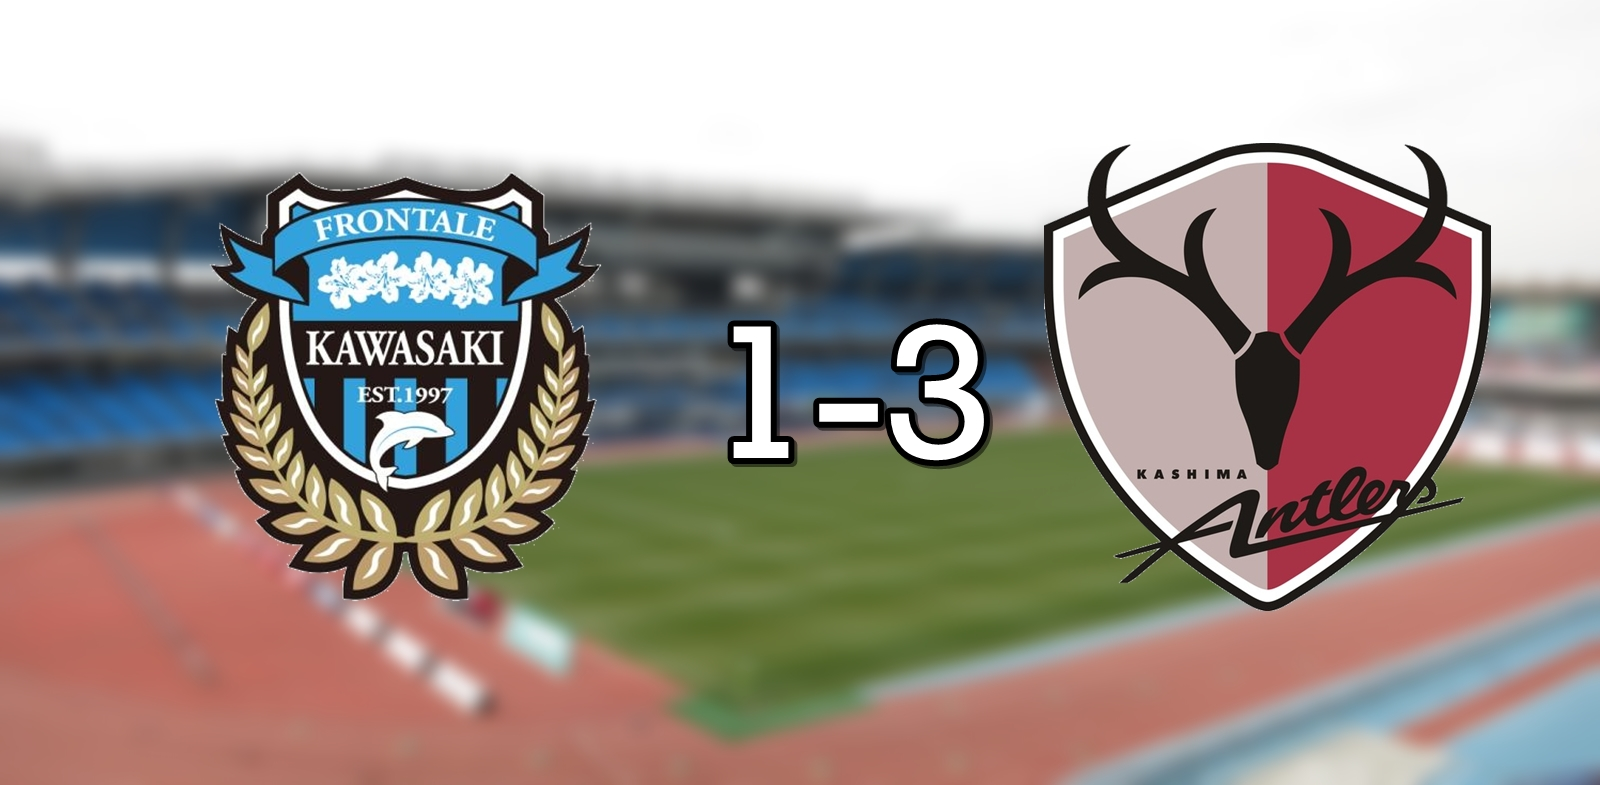 Frontale 1-3 Kashima